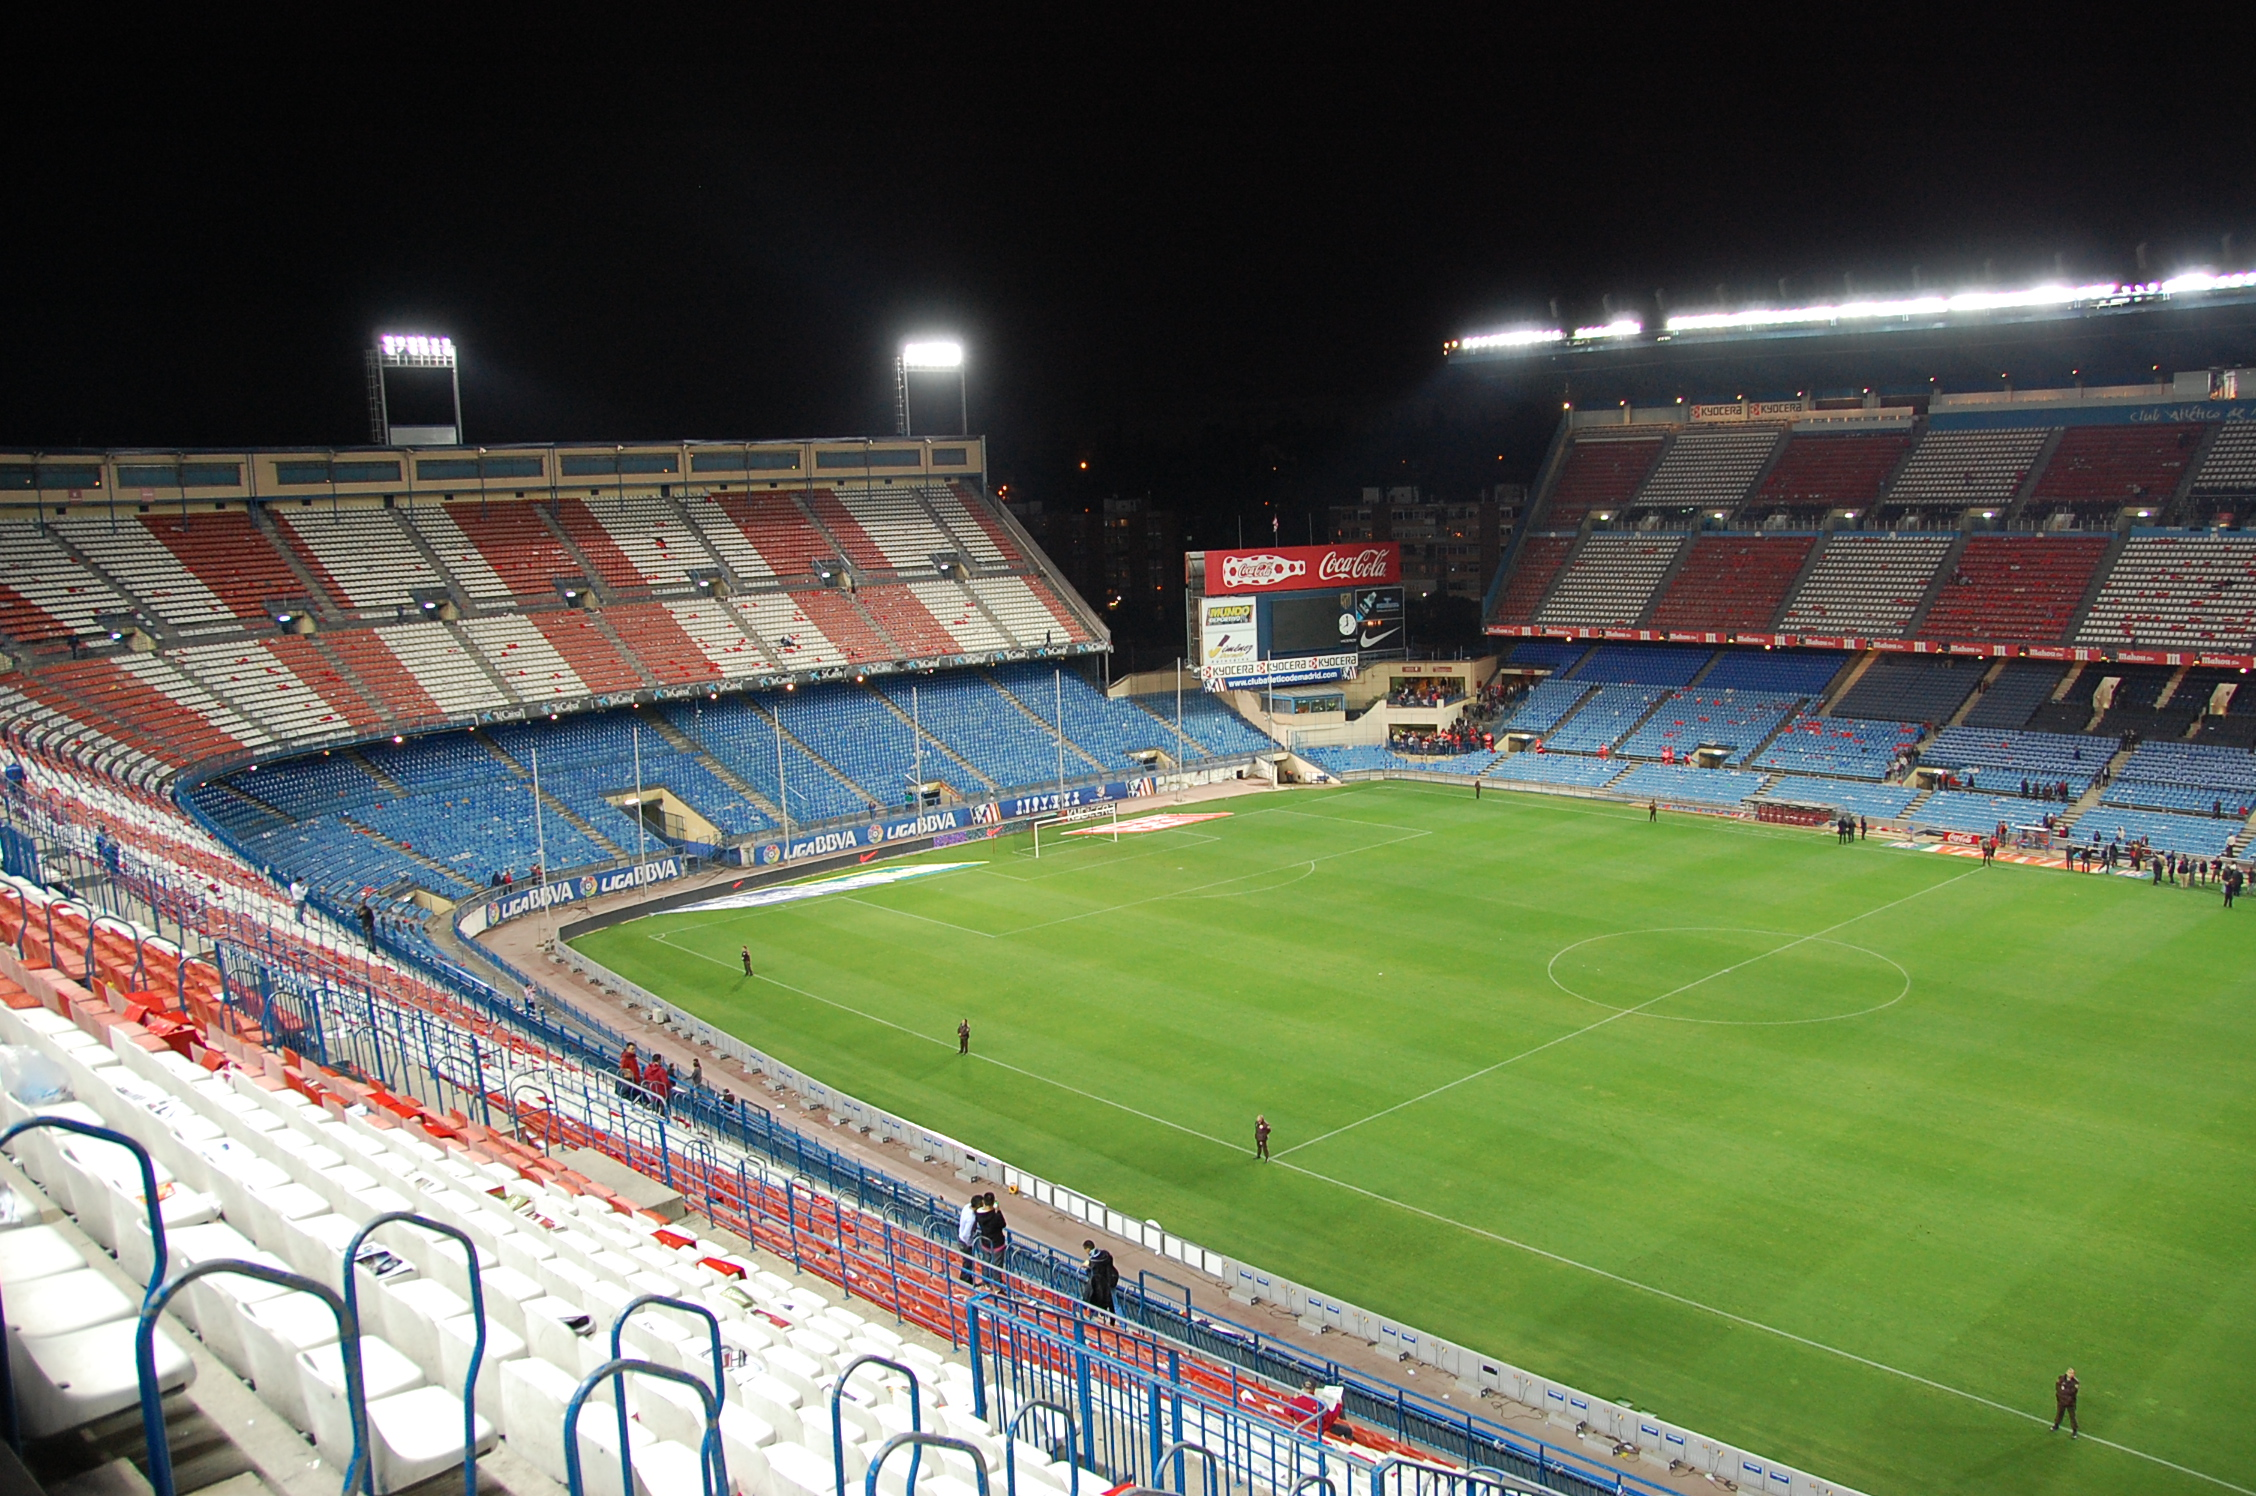 Le mytique stade Vicente Calderon.